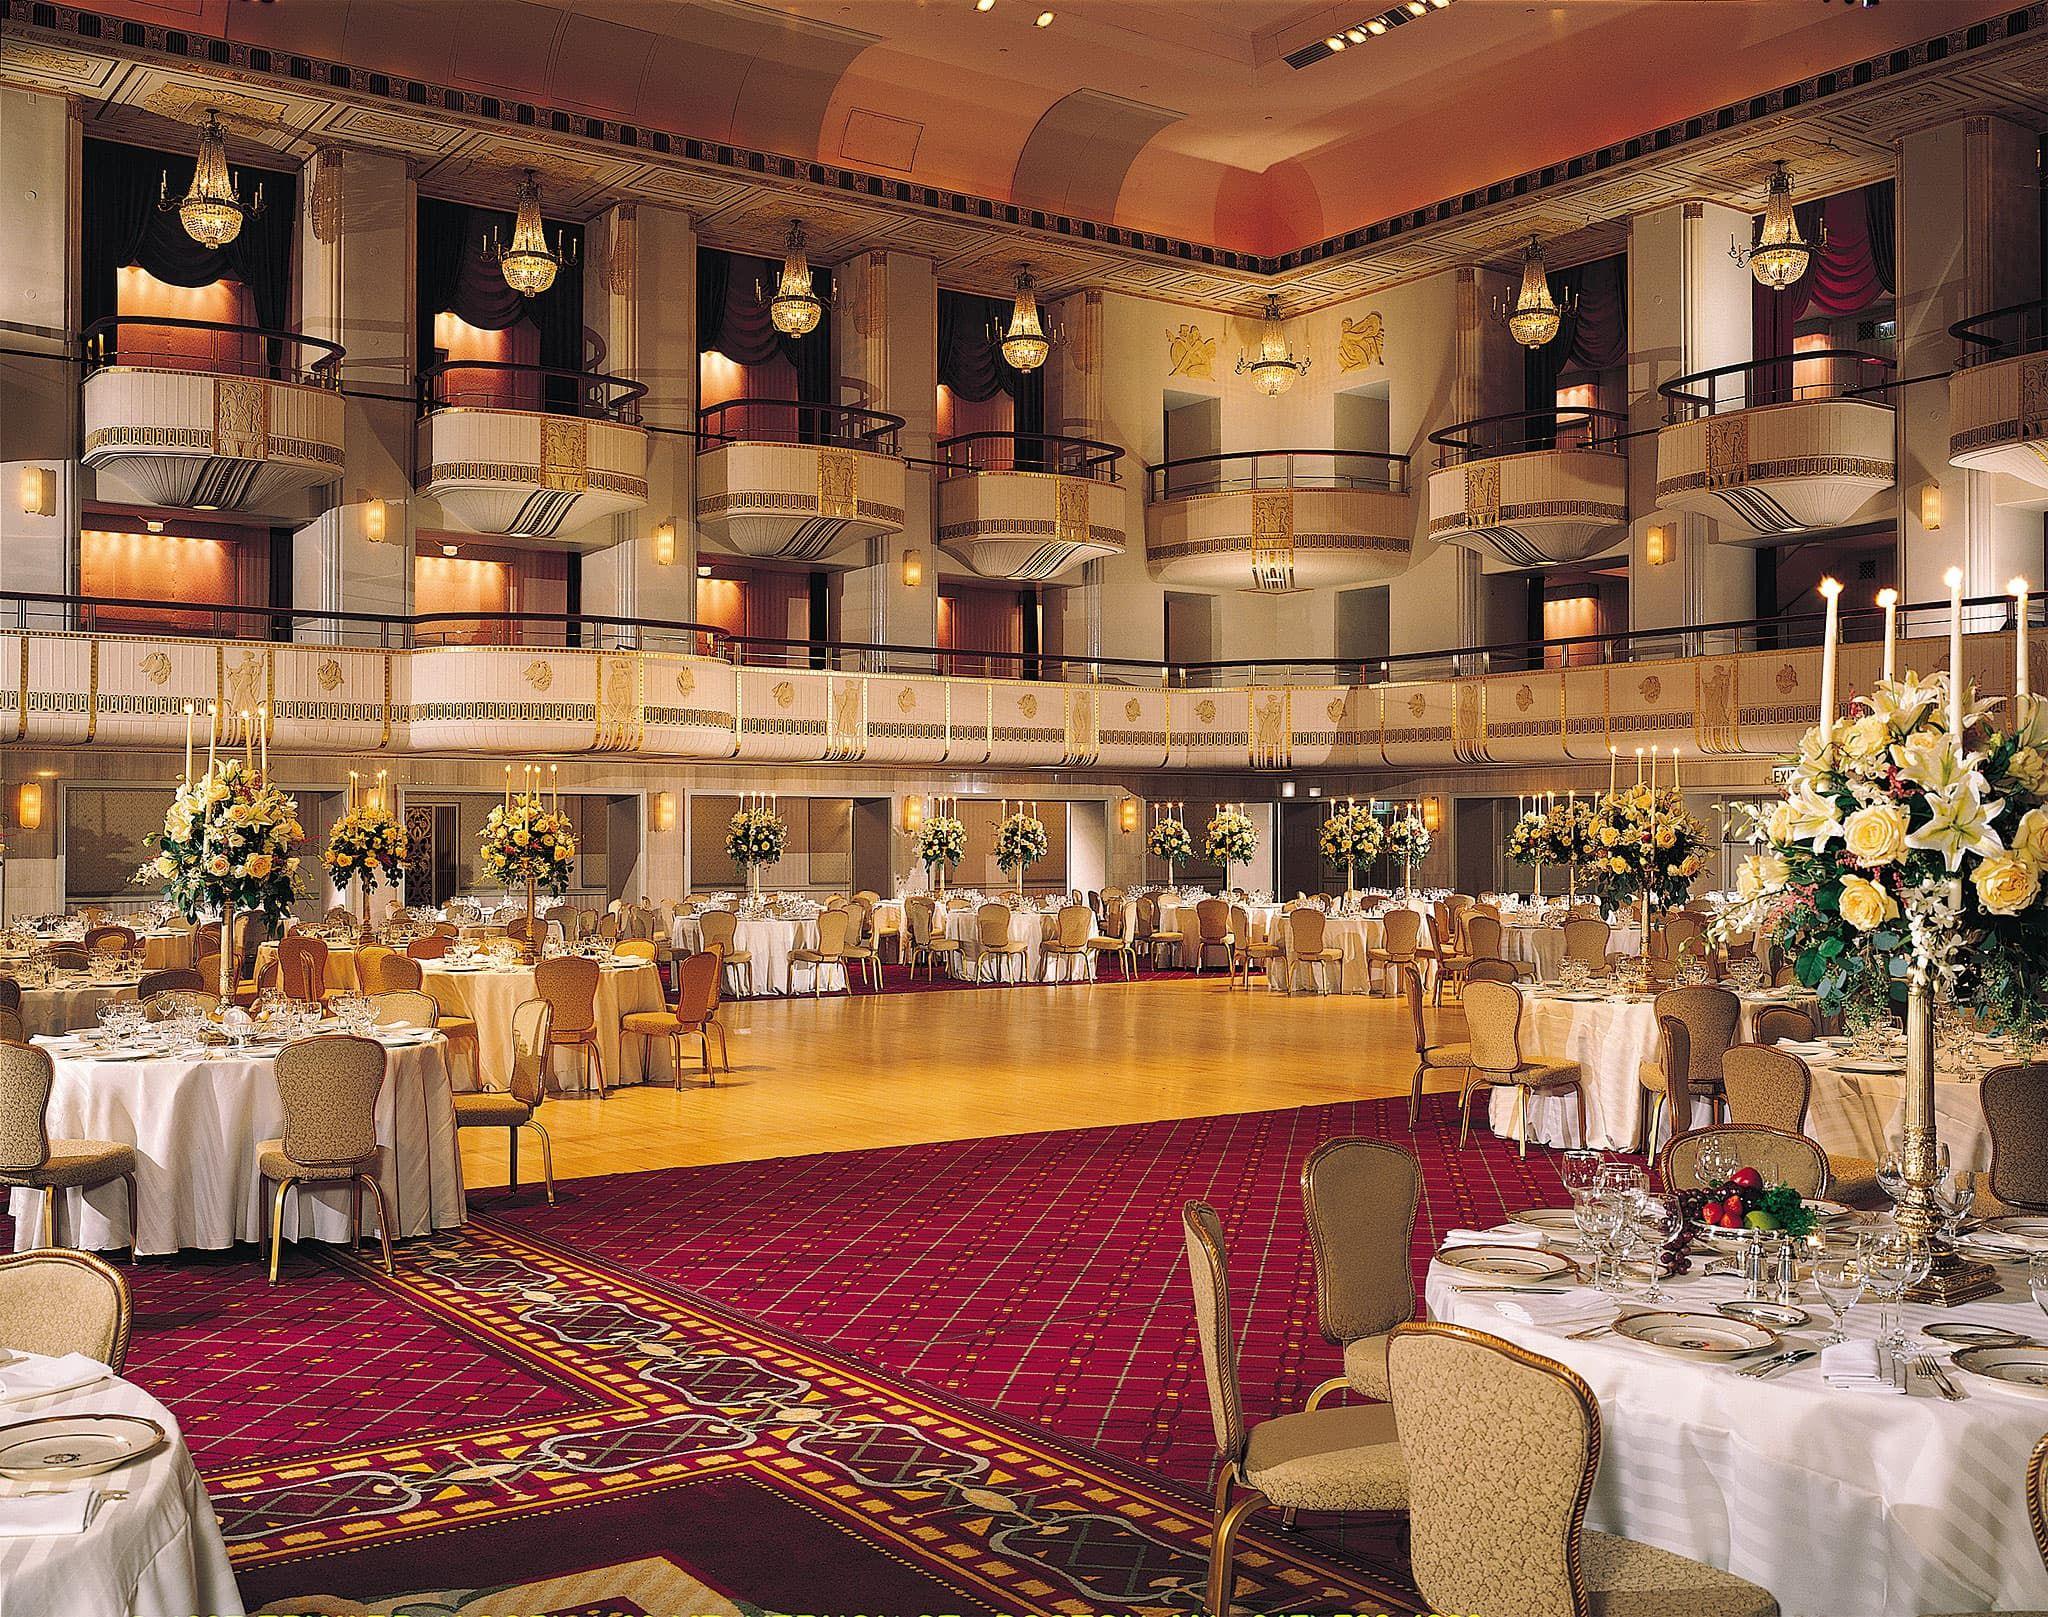 Grand Ballroom At The Waldorf Astoria New York Hotel Credit Hilton Worldwide